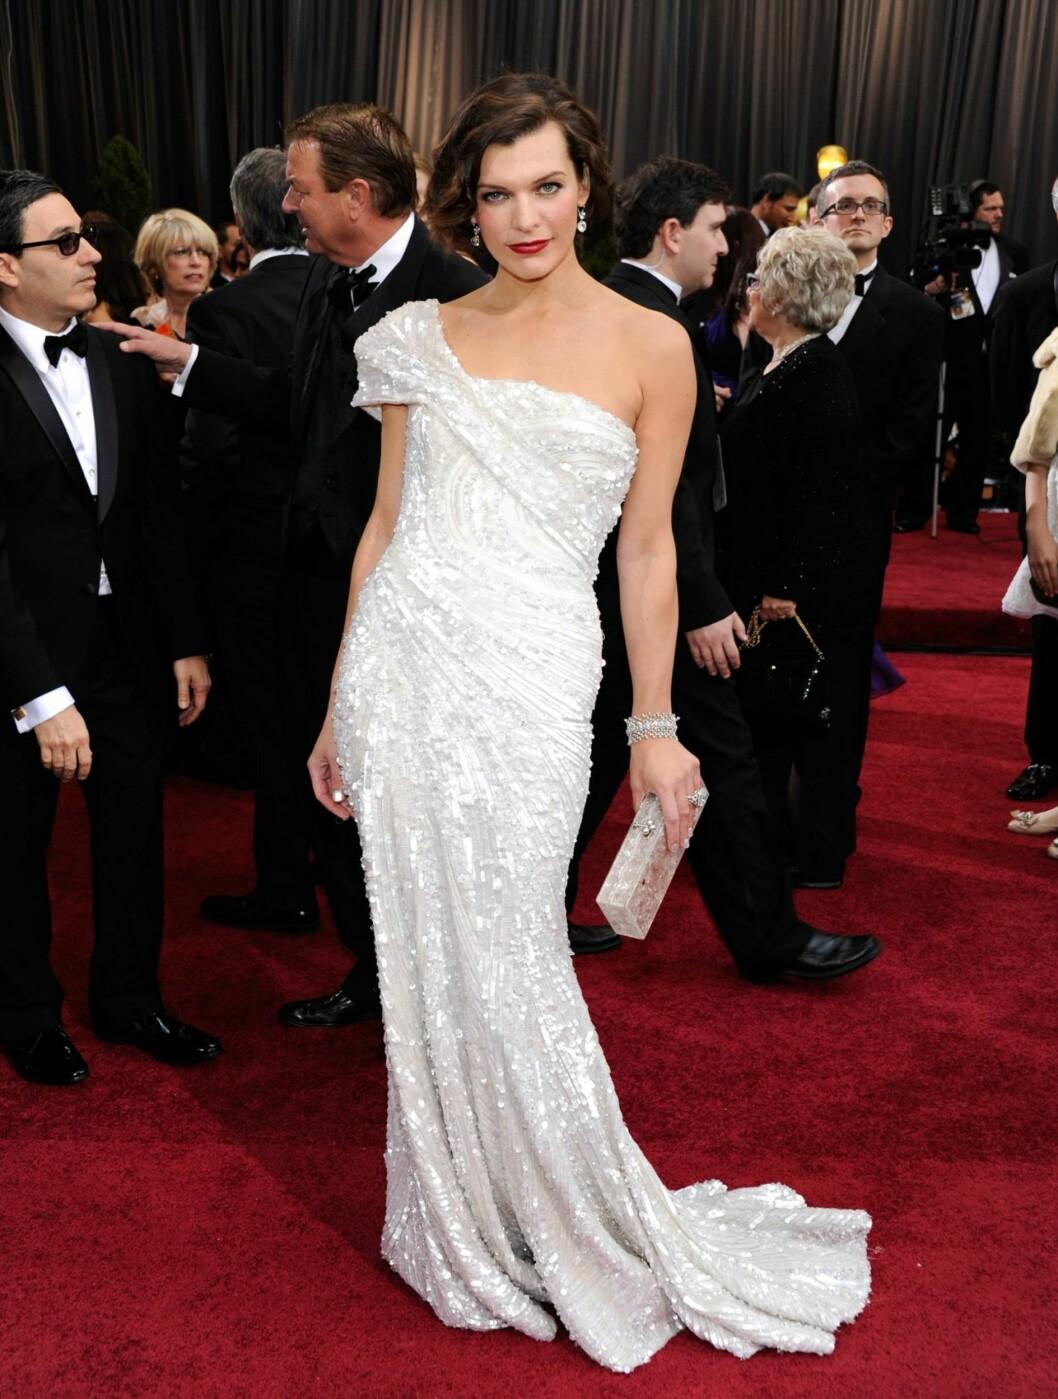 VAKKER: Milla Jovovich tok pusten fra de fremmøtte i en sexy kjole fra Elie Saab.  Foto: All Over Press